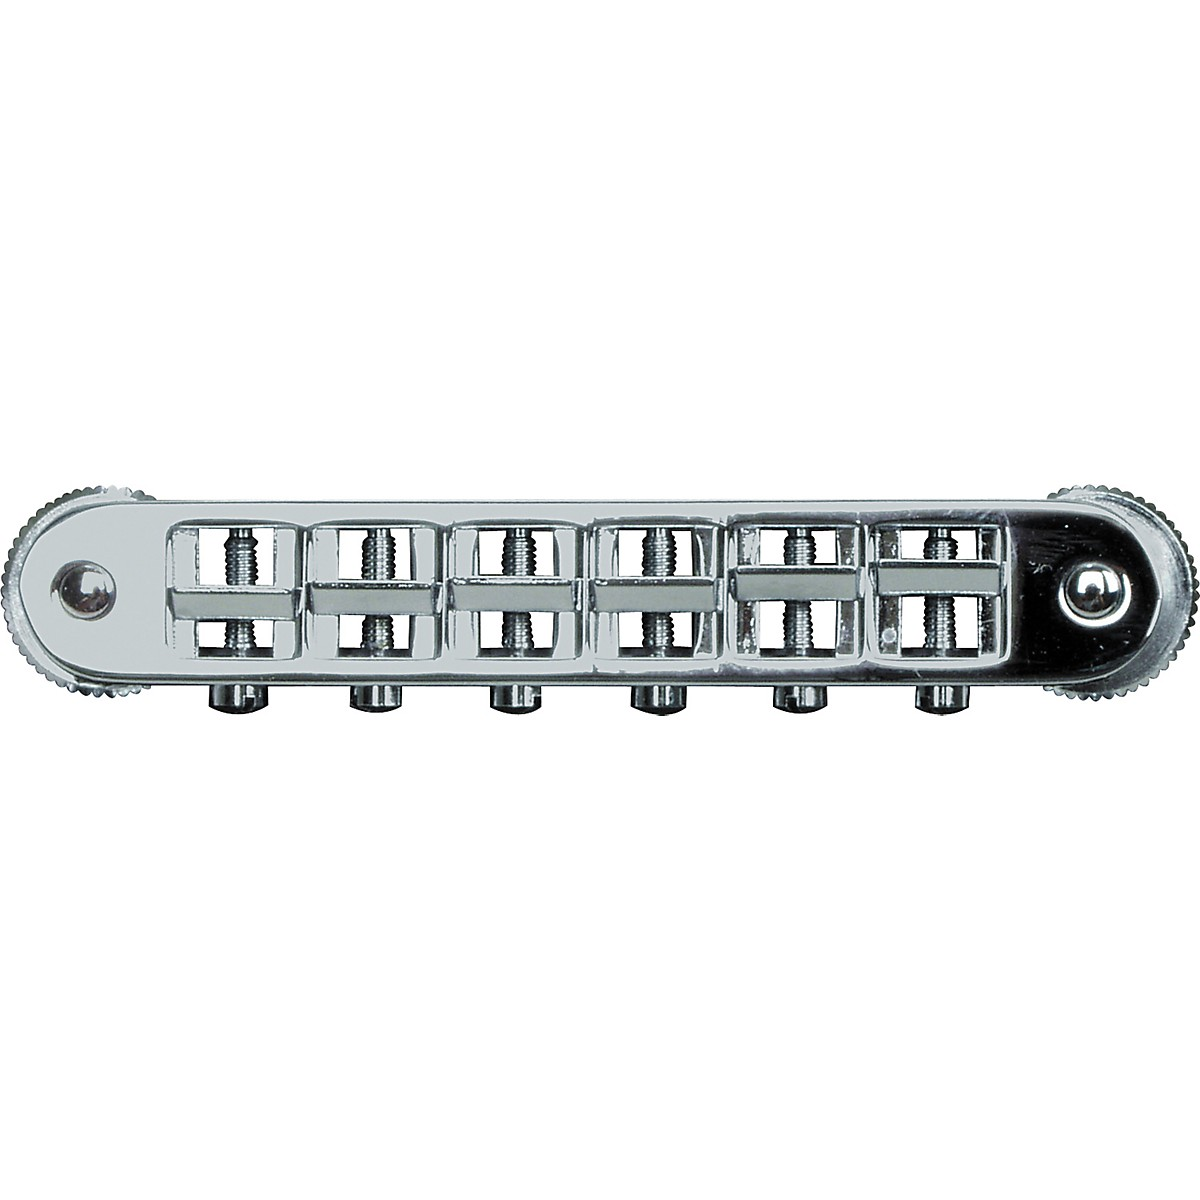 TonePros Standard Locking Tune-o-matic Bridge(small posts)